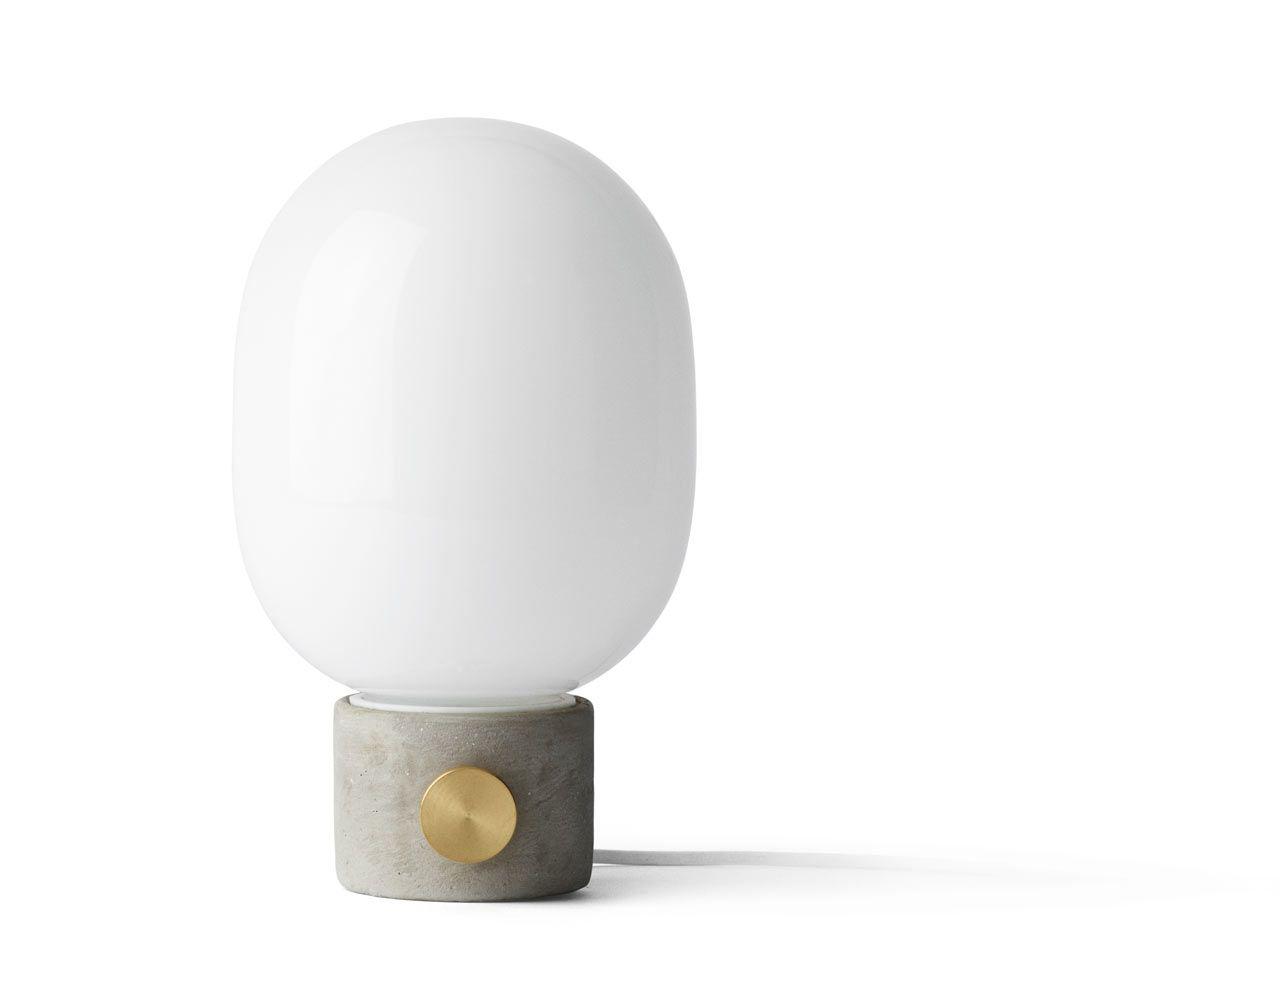 Furnishings Lamp Menuhome For By Jonas Concrete Wagell Hdctqrbsx Jwda 5c3qRjSL4A